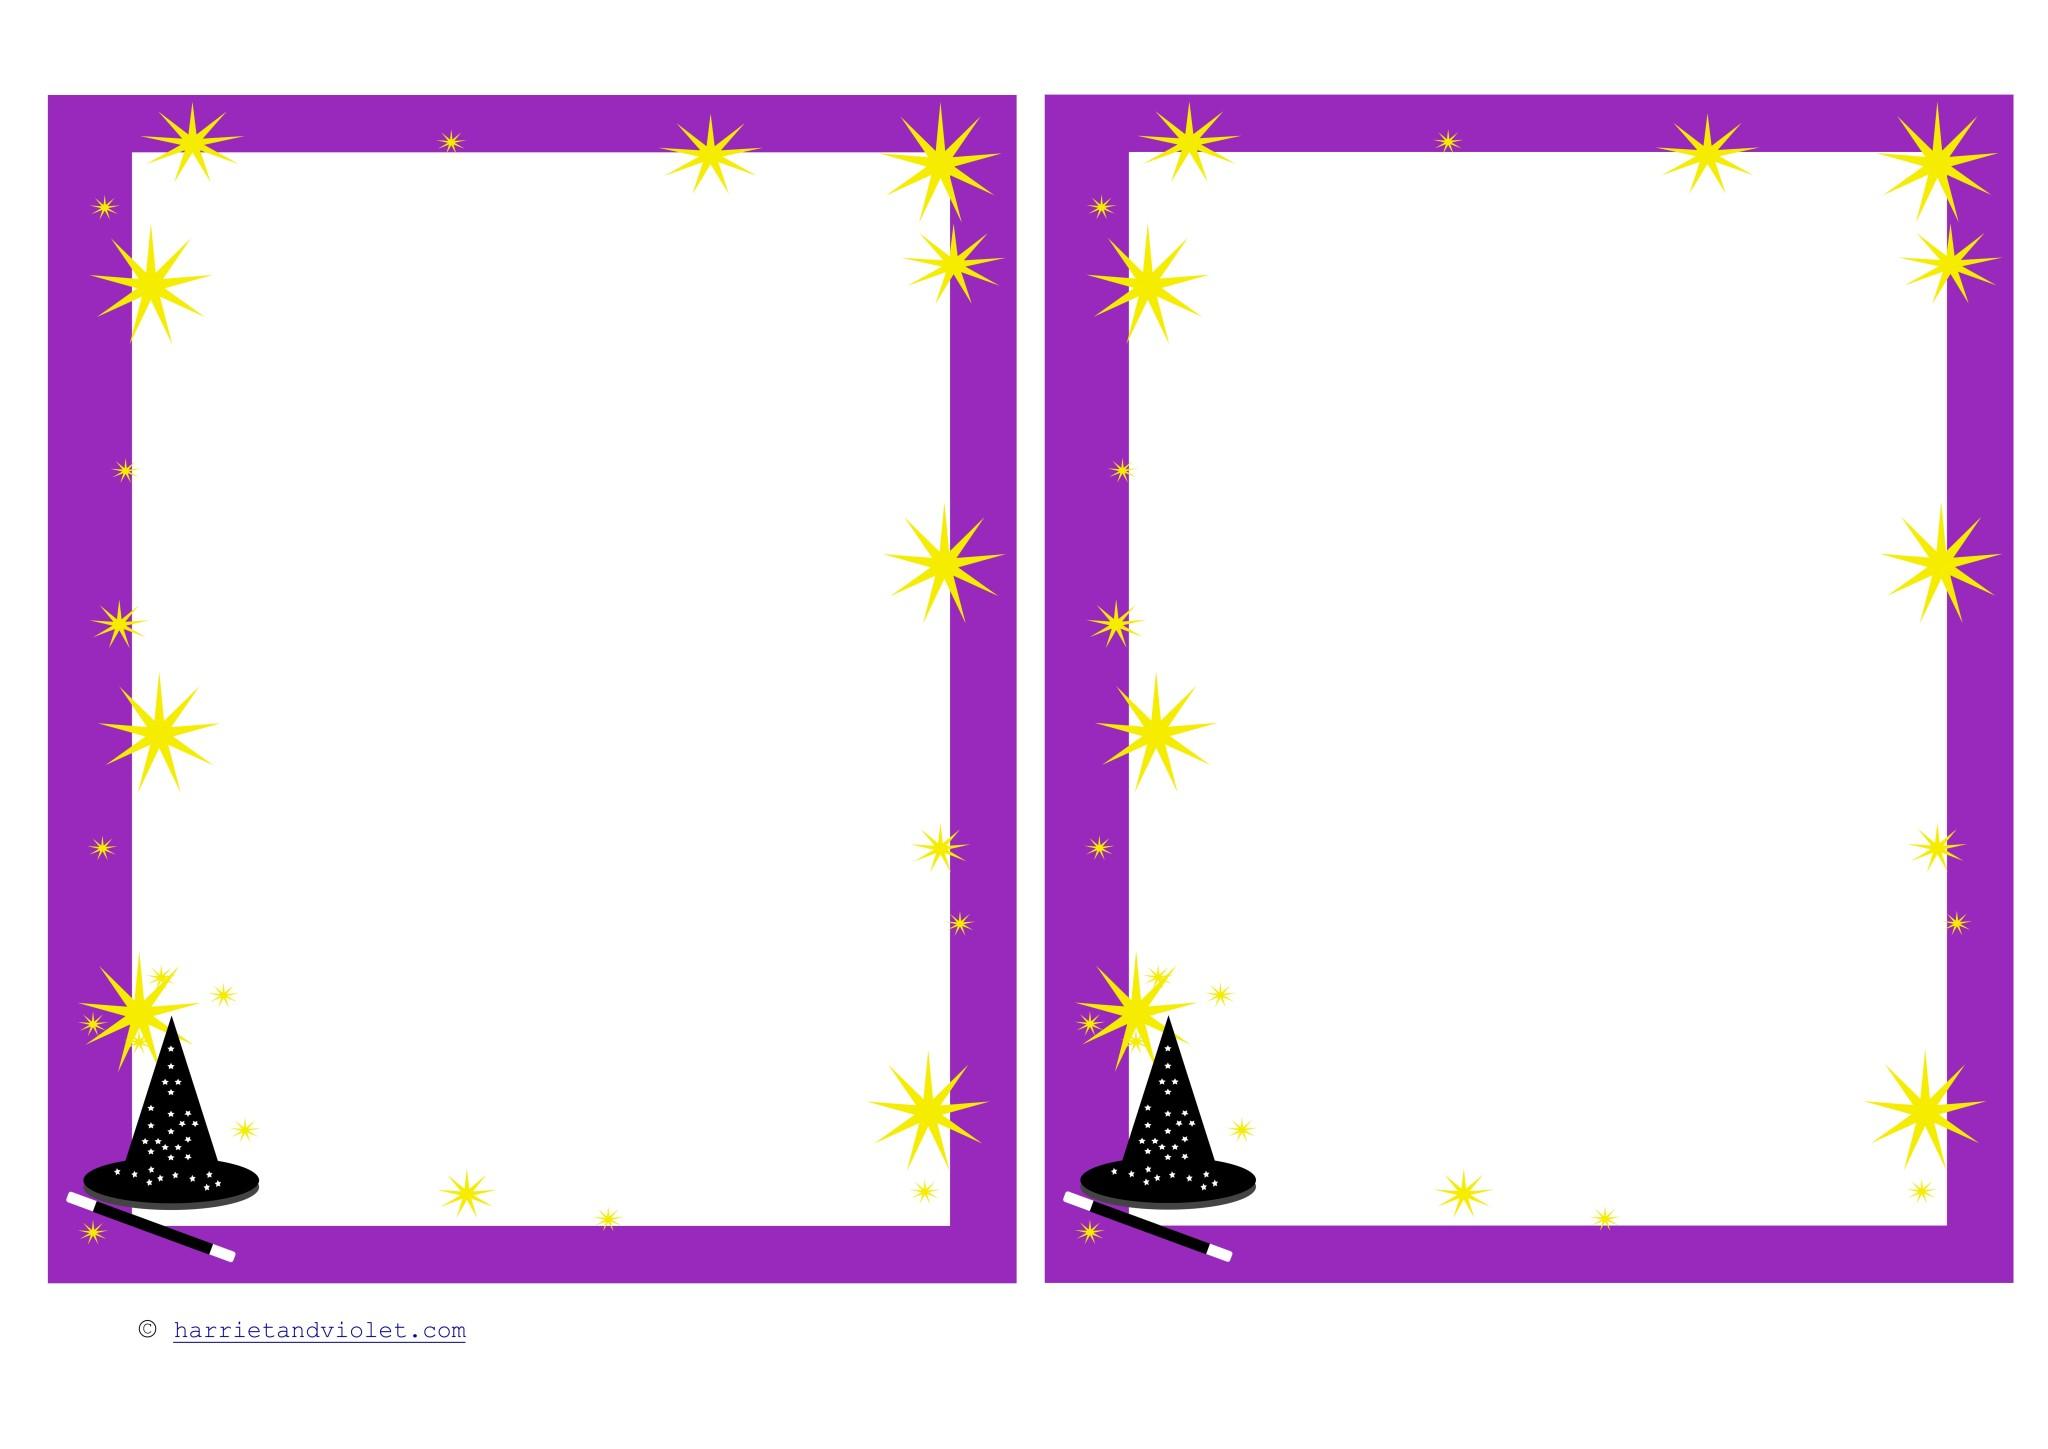 ... - Challenge Recording Sheet or Magic Border Paper - Harriet + Violet